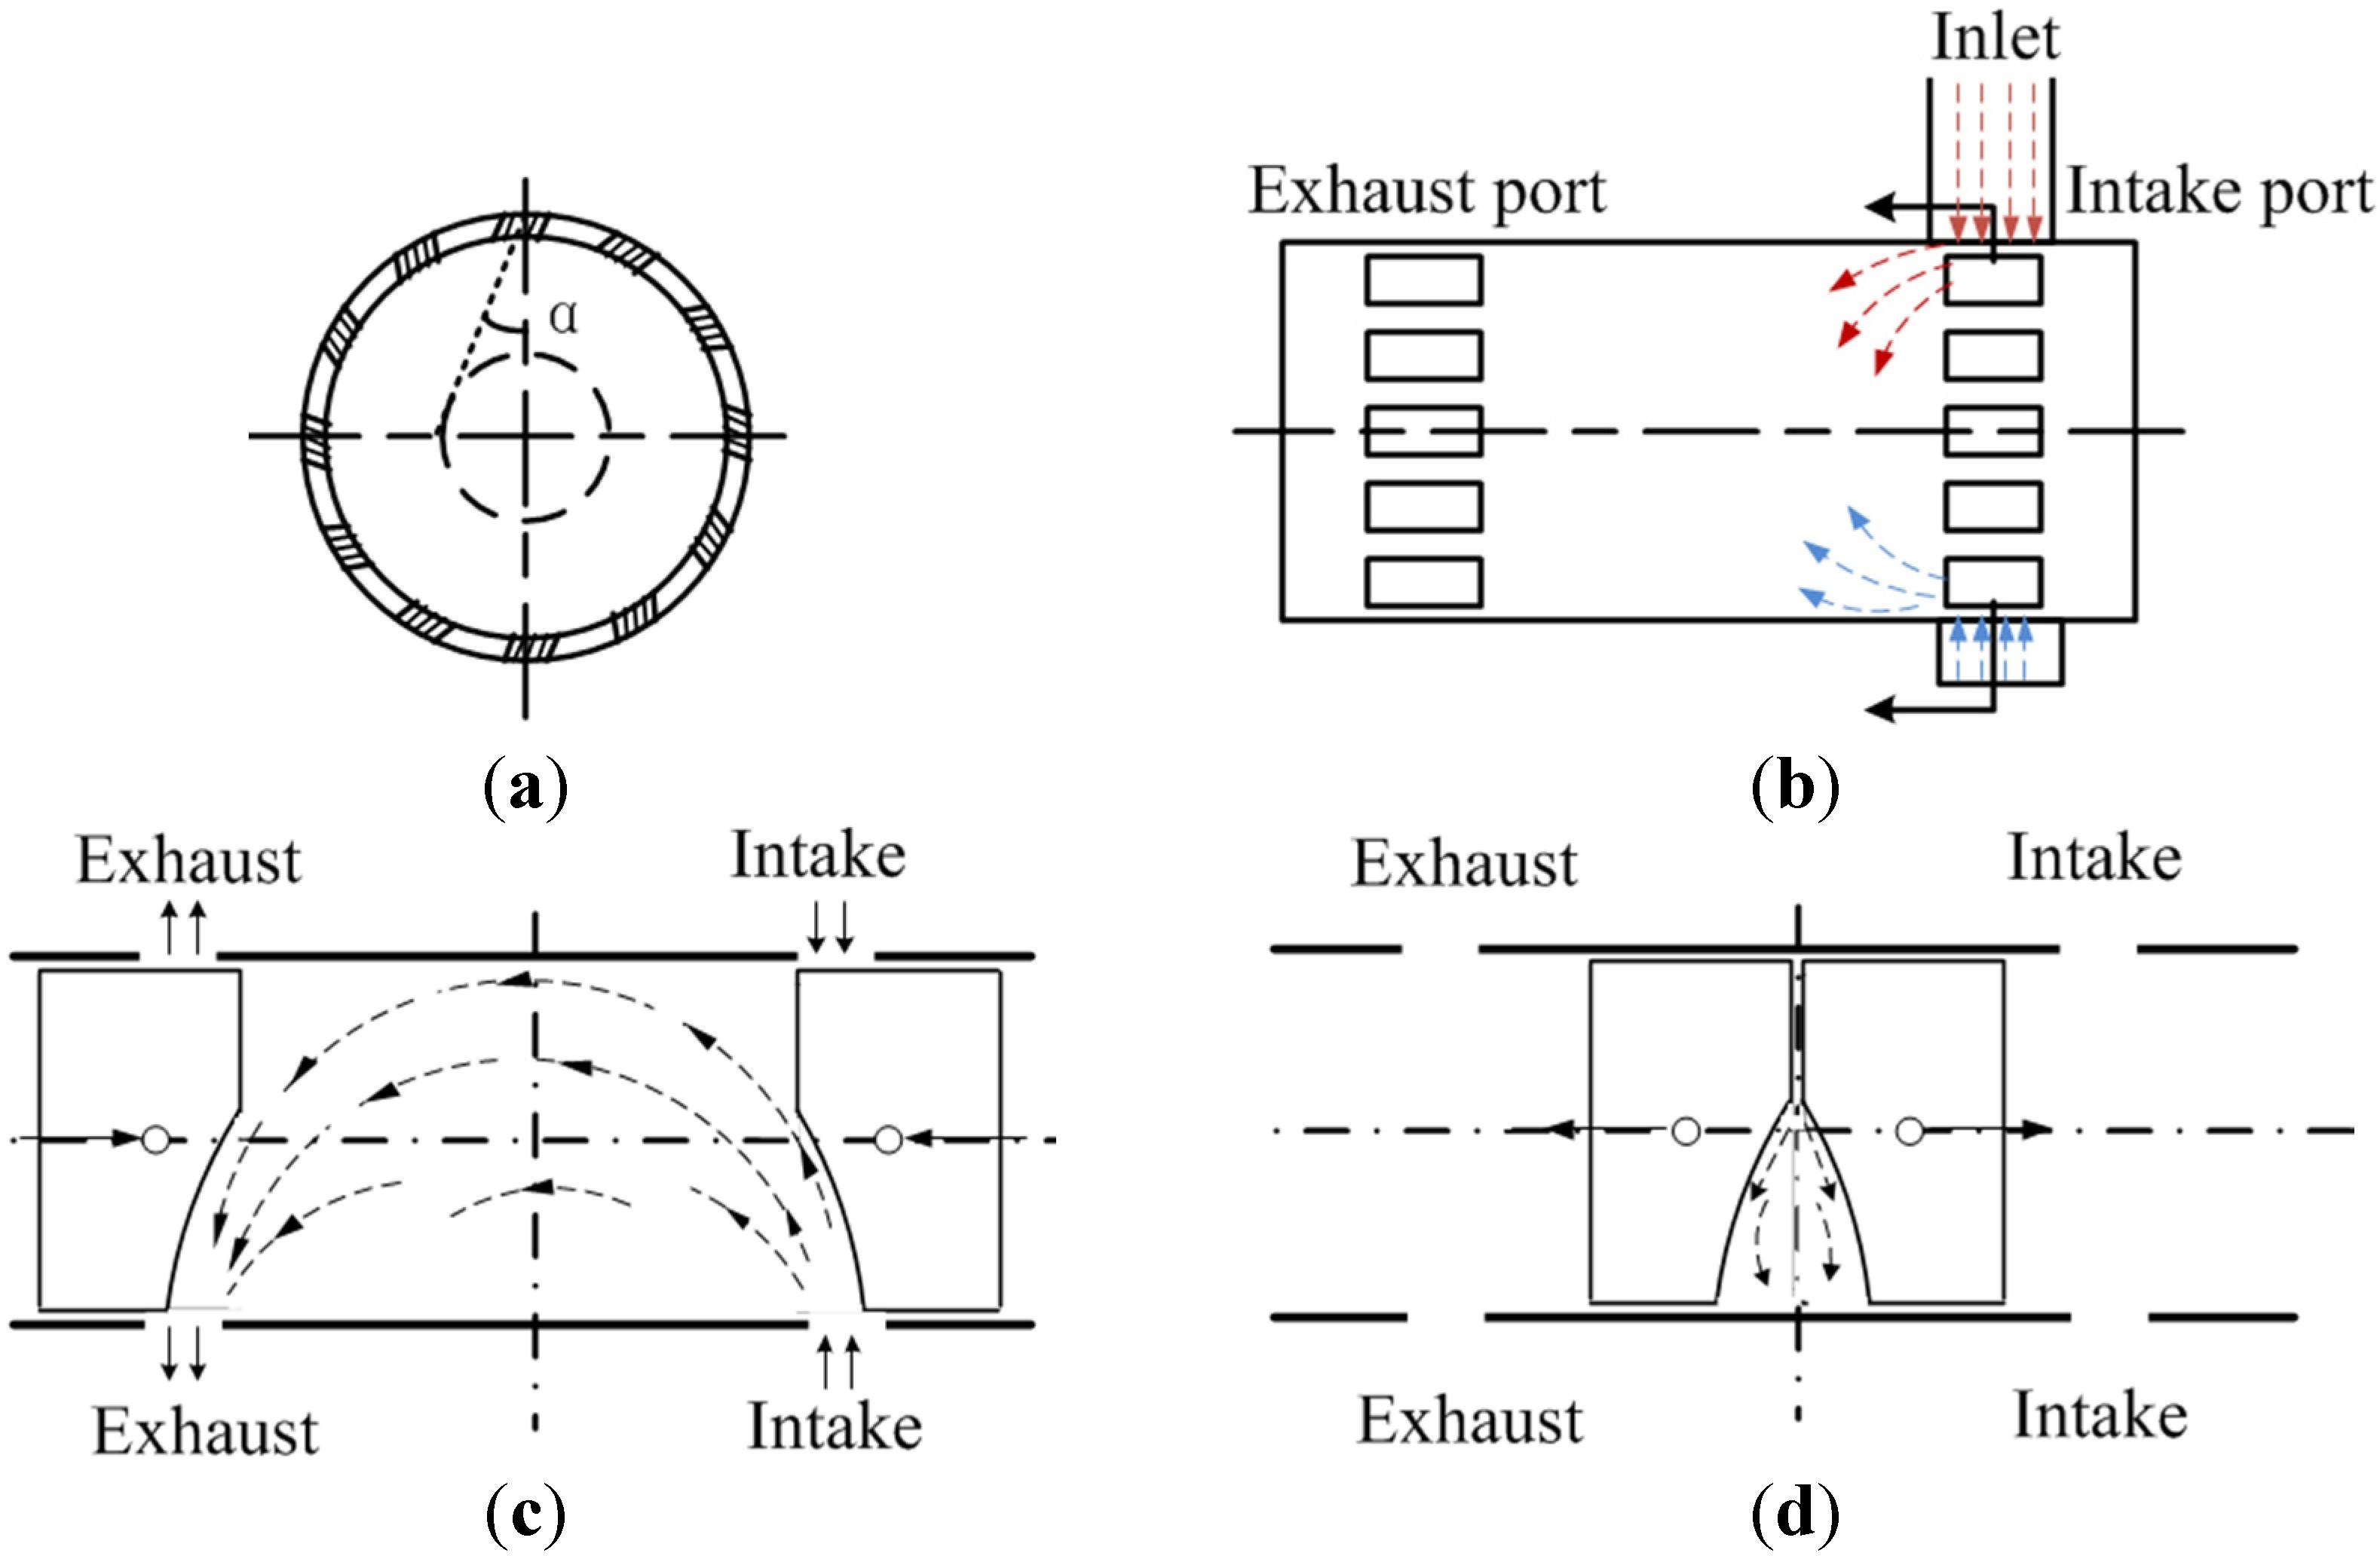 Four Stroke Engine Diagram Energies Free Full Text Of Four Stroke Engine  Diagram Craftsman 30cc 4